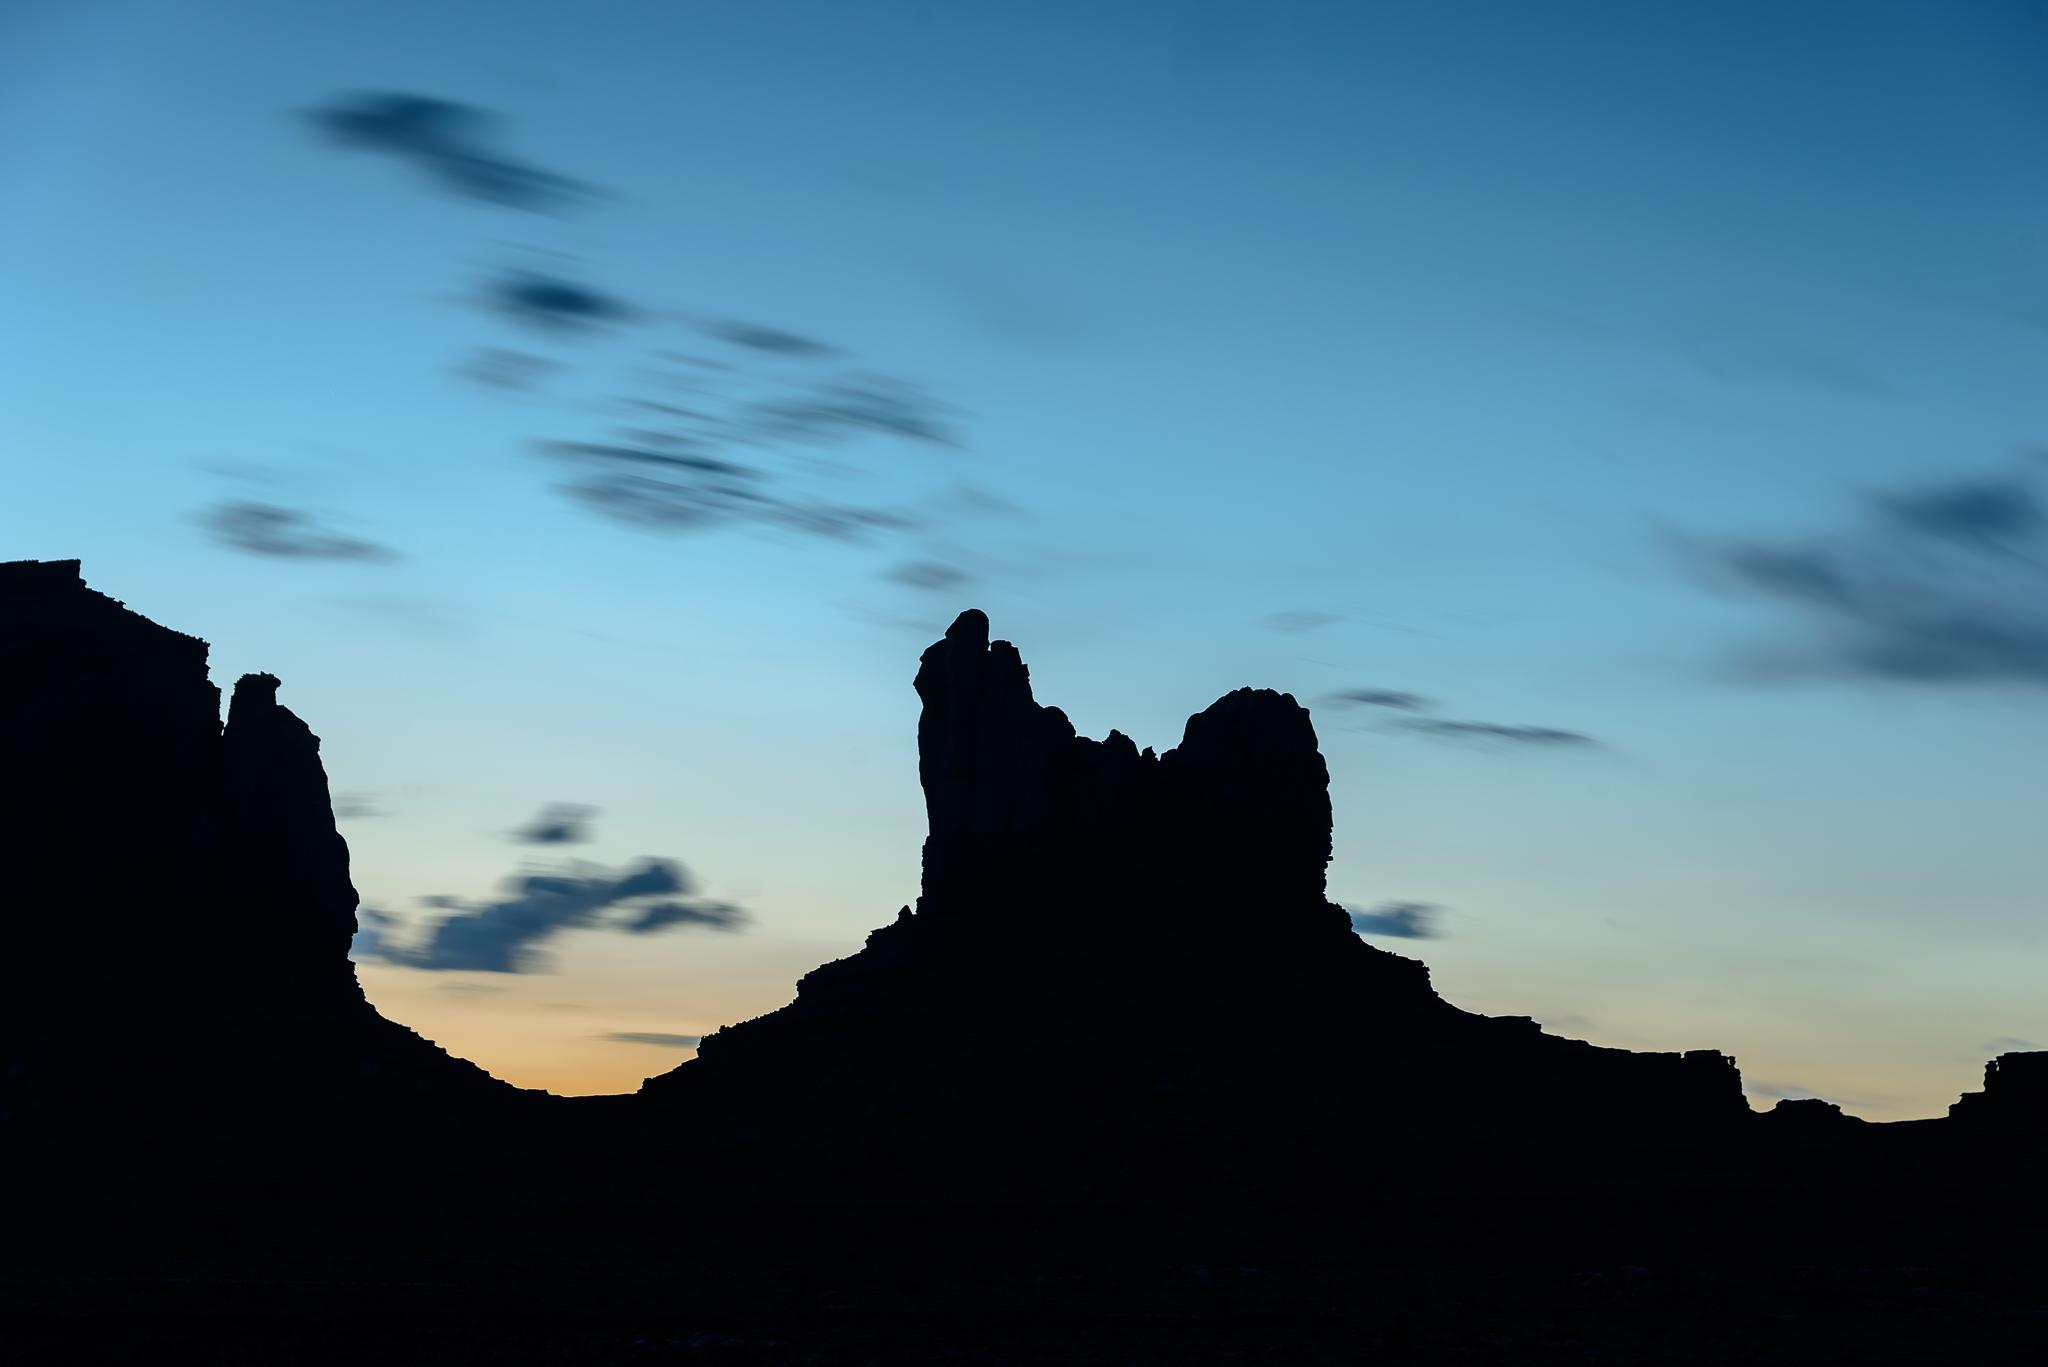 Twilight time. Monument Valley, UT.